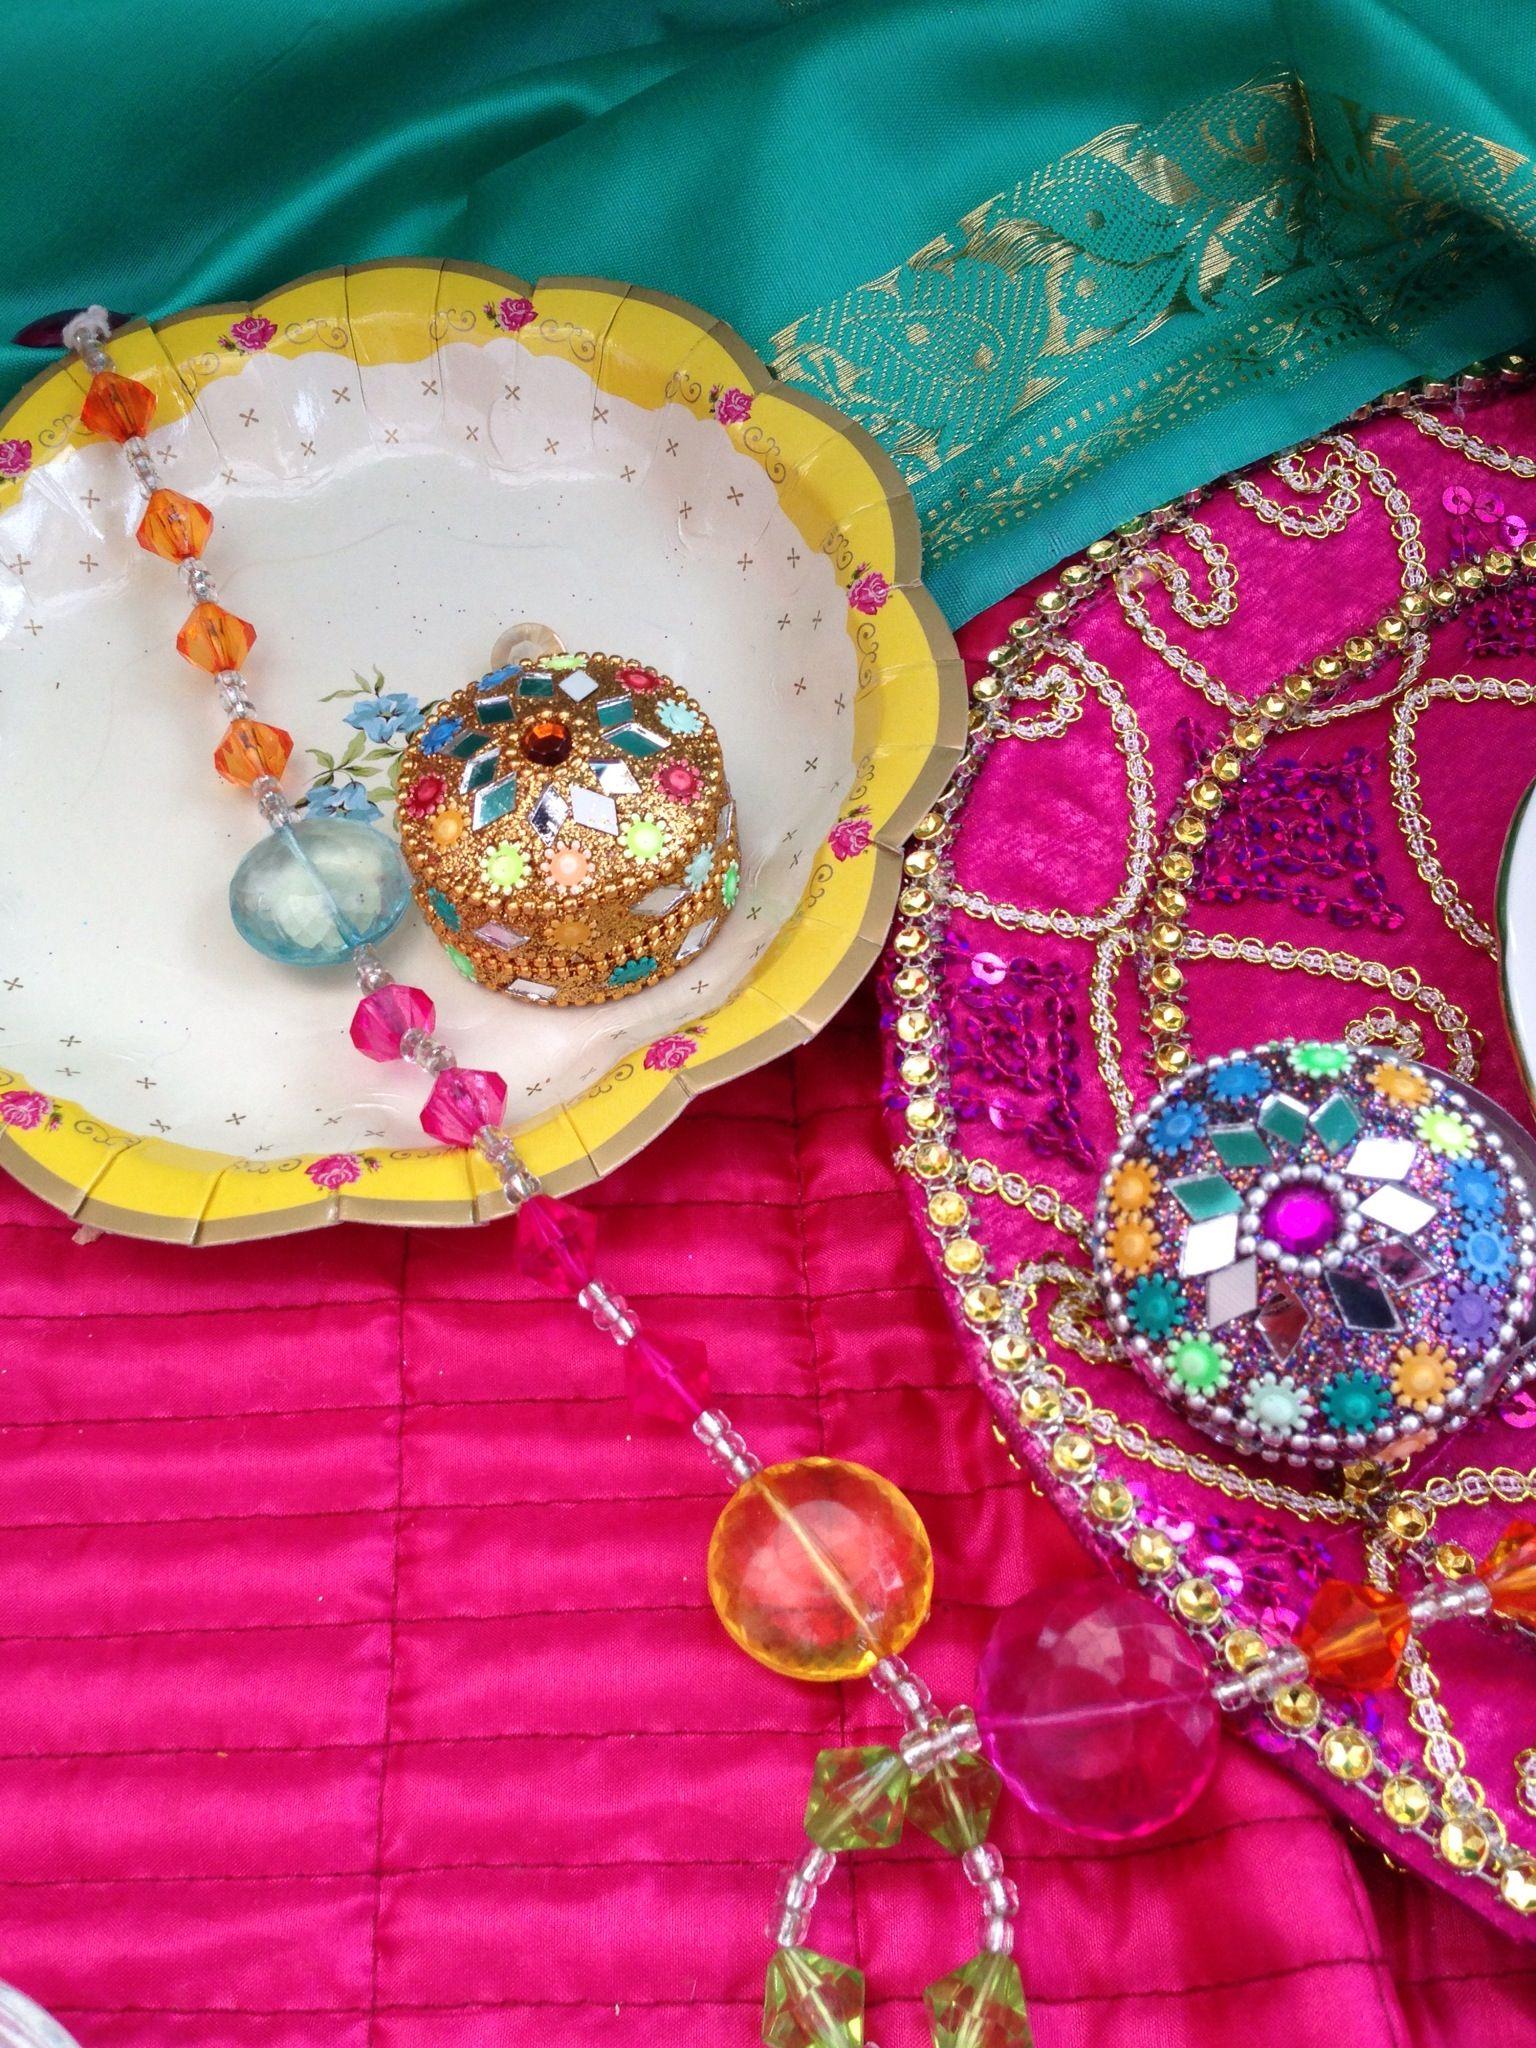 Stunning gemstone trinket favour boxes displayed on vintage plates ...